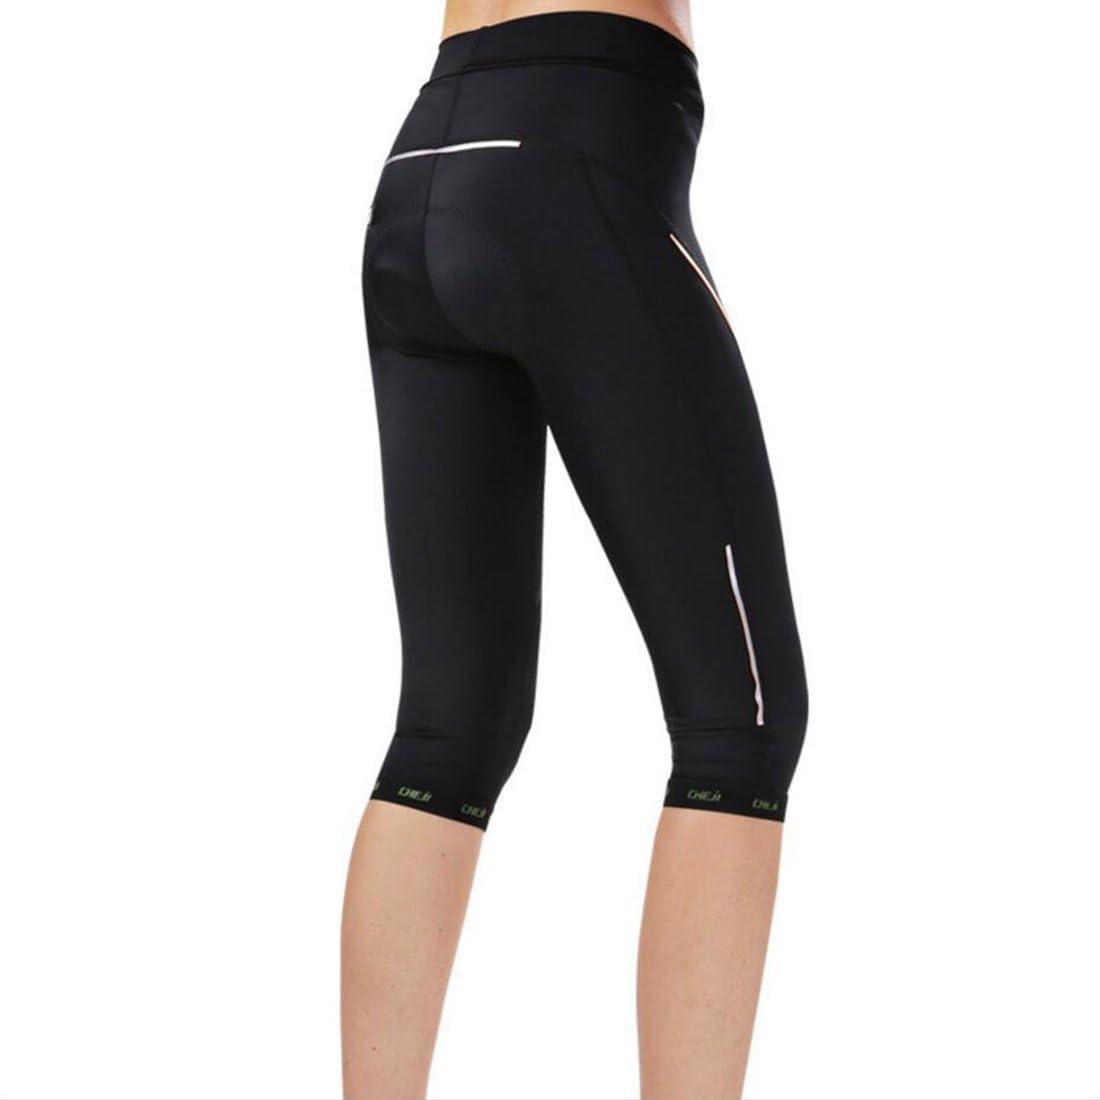 GWELL Mujer Bicicleta Pantalones Ciclismo Pantalones 3D Acolchado Cilindro de pantal/ón 3//4/Comodidad Slim Fit